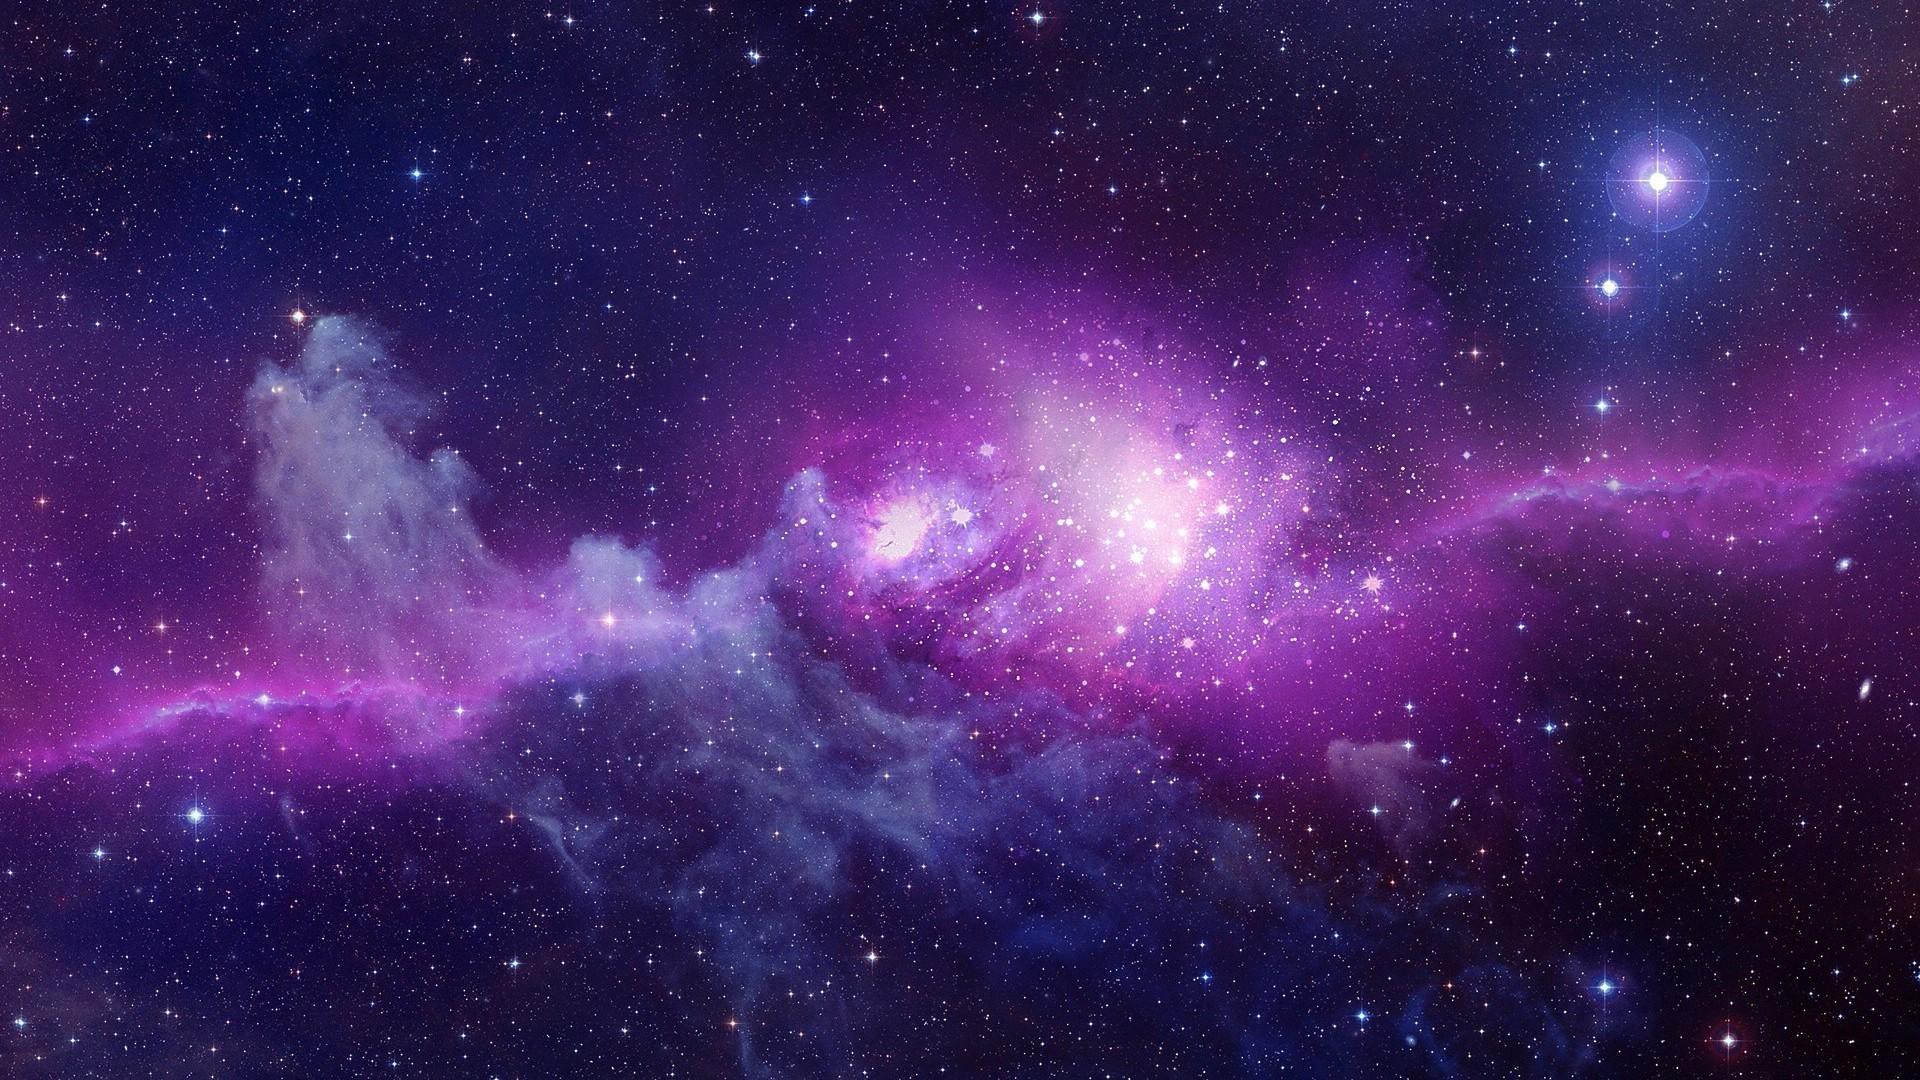 purple-galaxy-space-hd-wallpapers-1920×1080